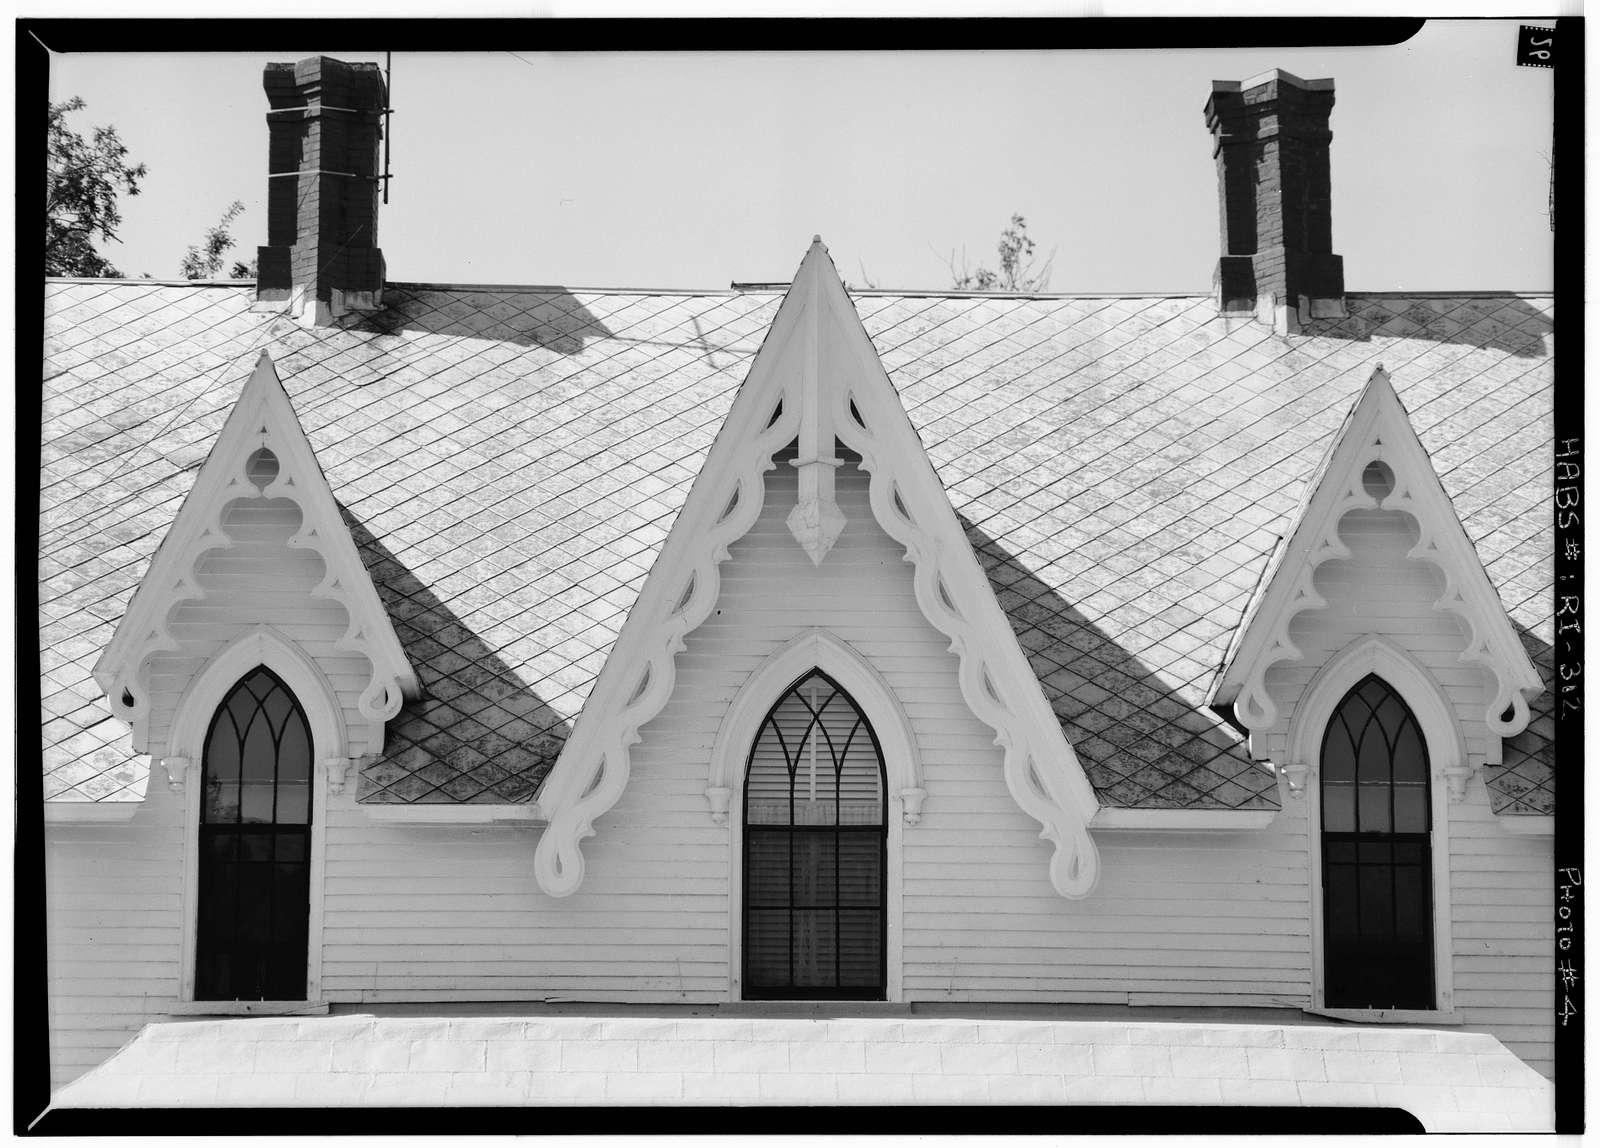 Daniel T. Swinburne House, 6 Greenough Place, Newport, Newport County, RI